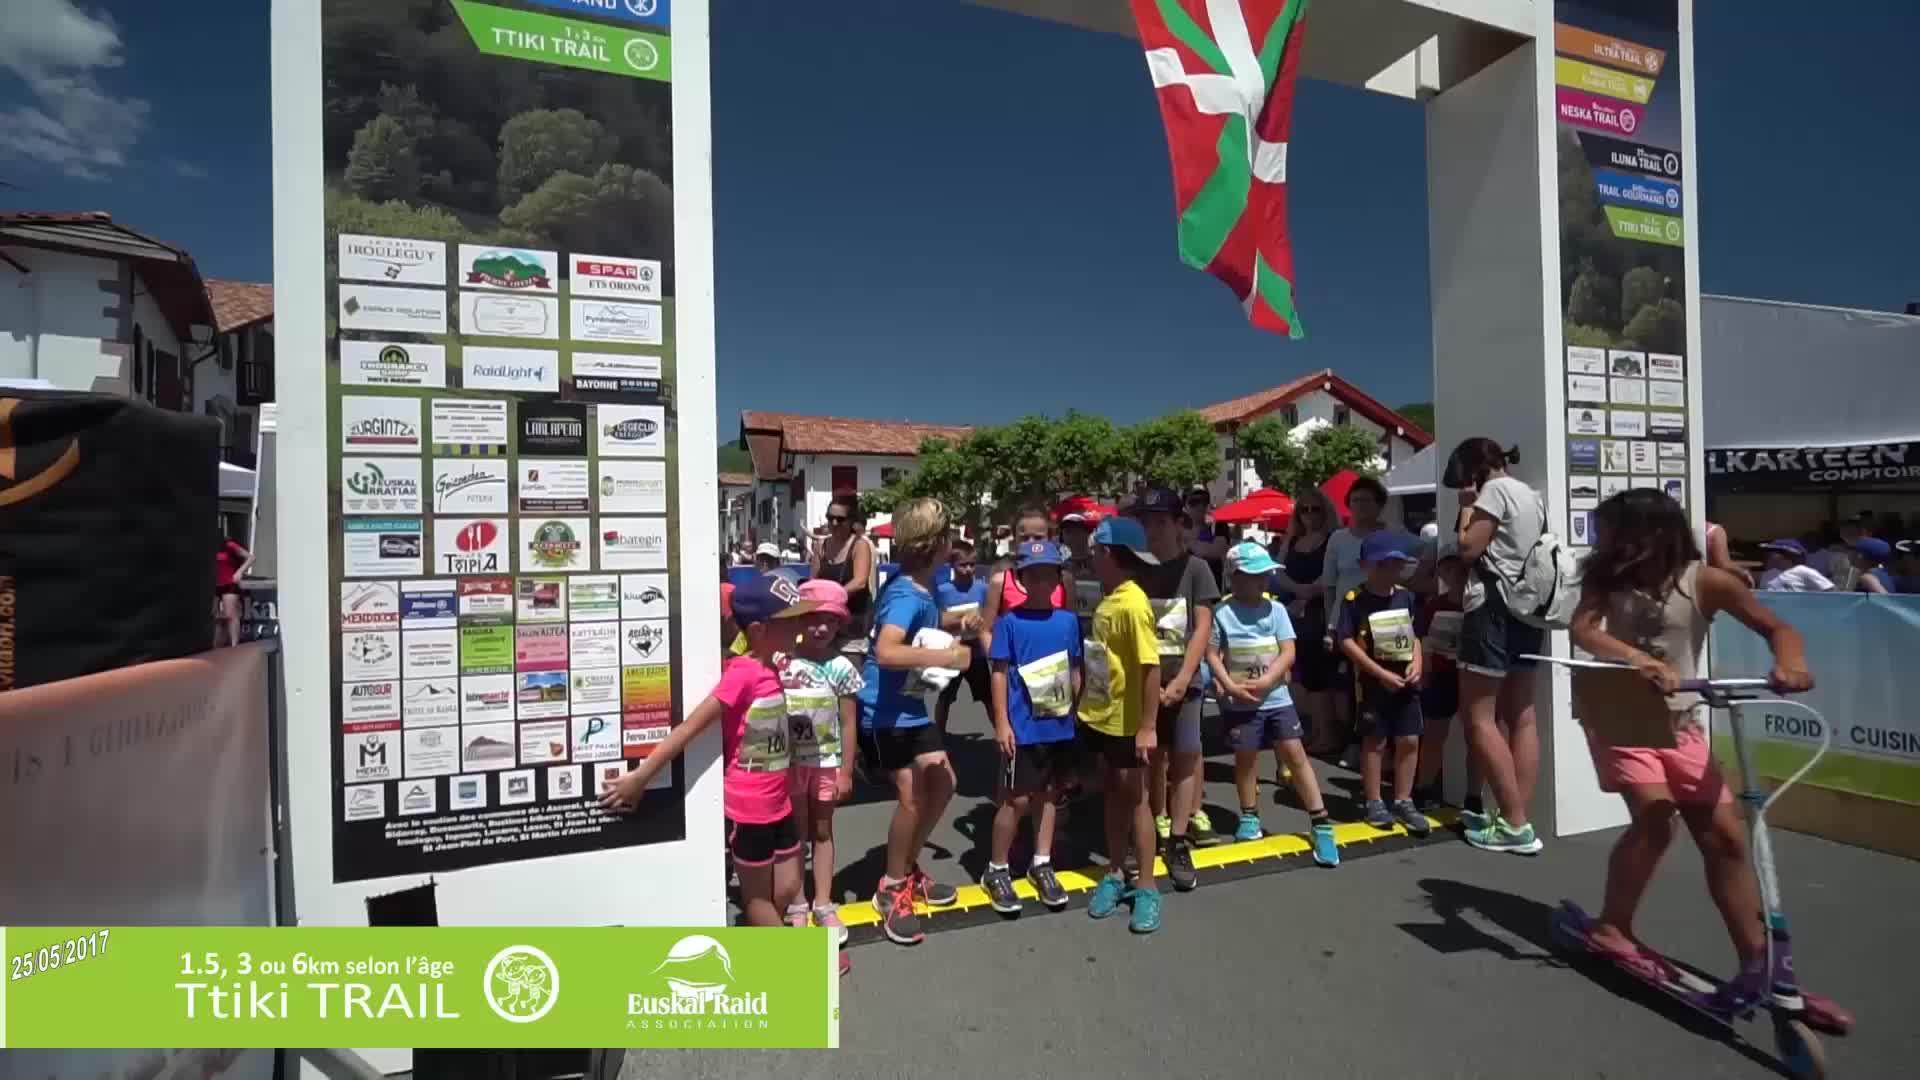 Euskal Trail 2017: Ttiki Trail